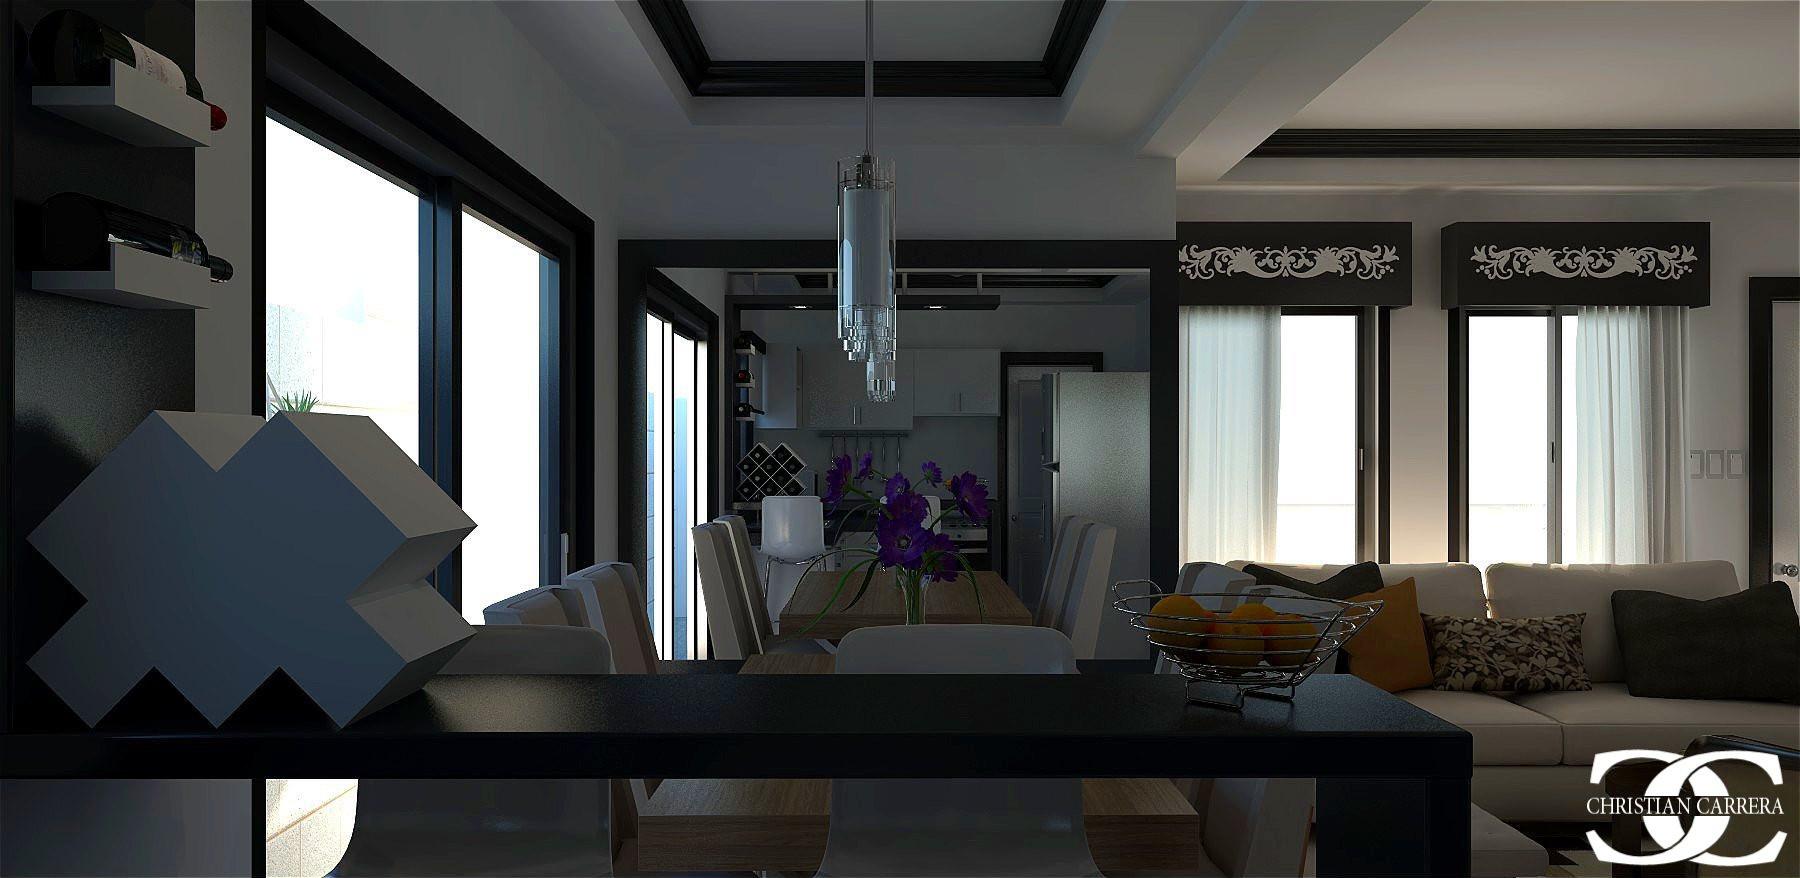 2019 sept 2 storey interior argona ground floor 05 mark.jpg